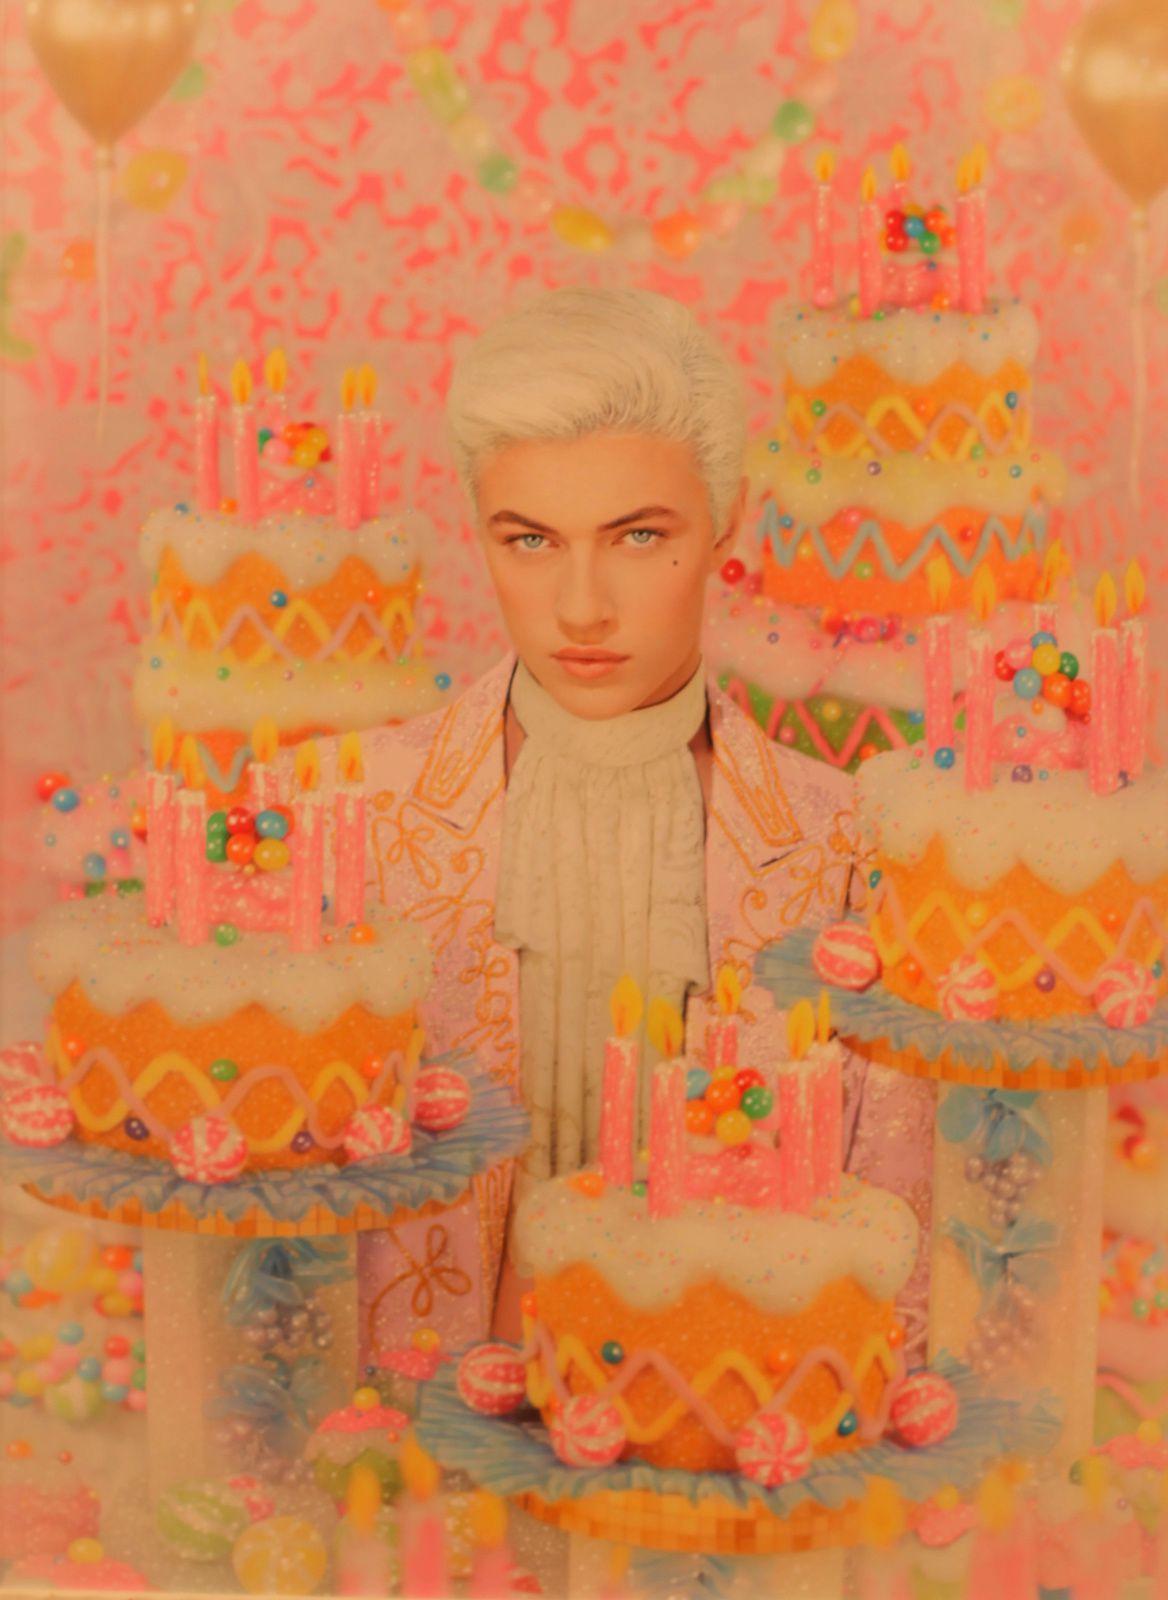 """Candy Paradise (Lucky Blue Smith)"", 2015 de PIERRE et GILLES - Courtesy Galerie TEMPLON © Photo Éric Simon"